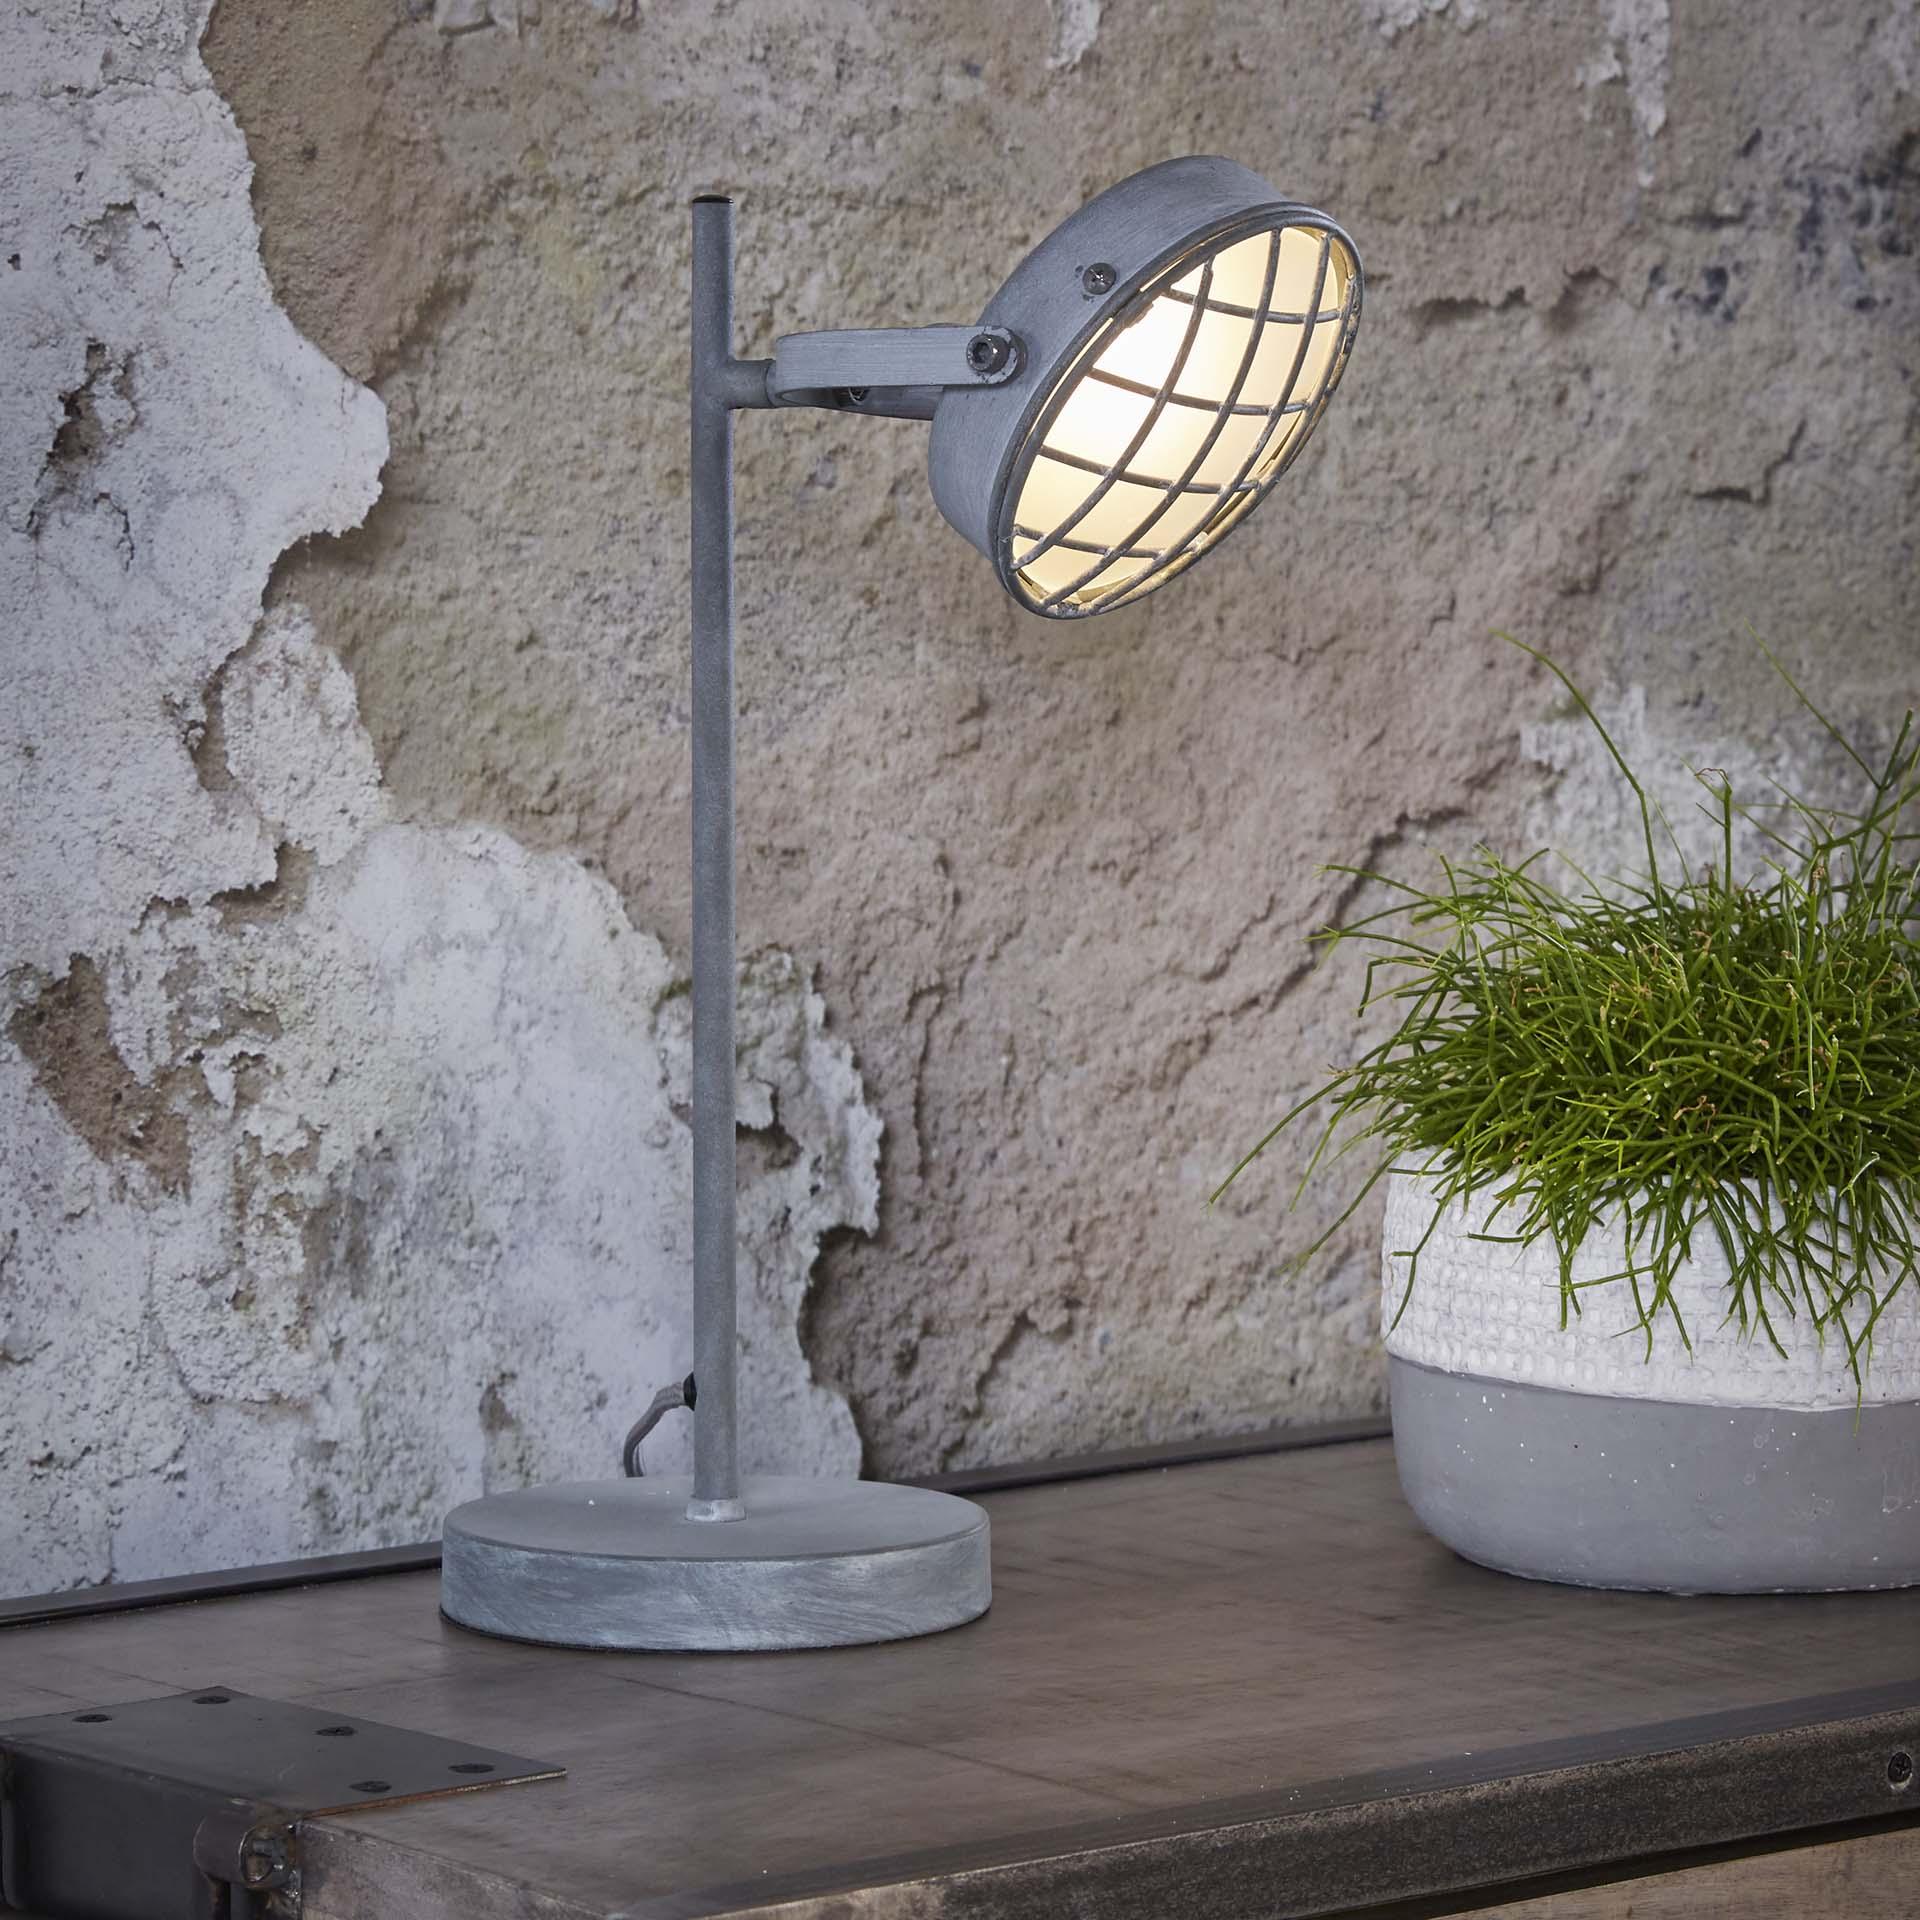 Tafellamp 'Brendan' betonlook LED Verlichting | Tafellampen